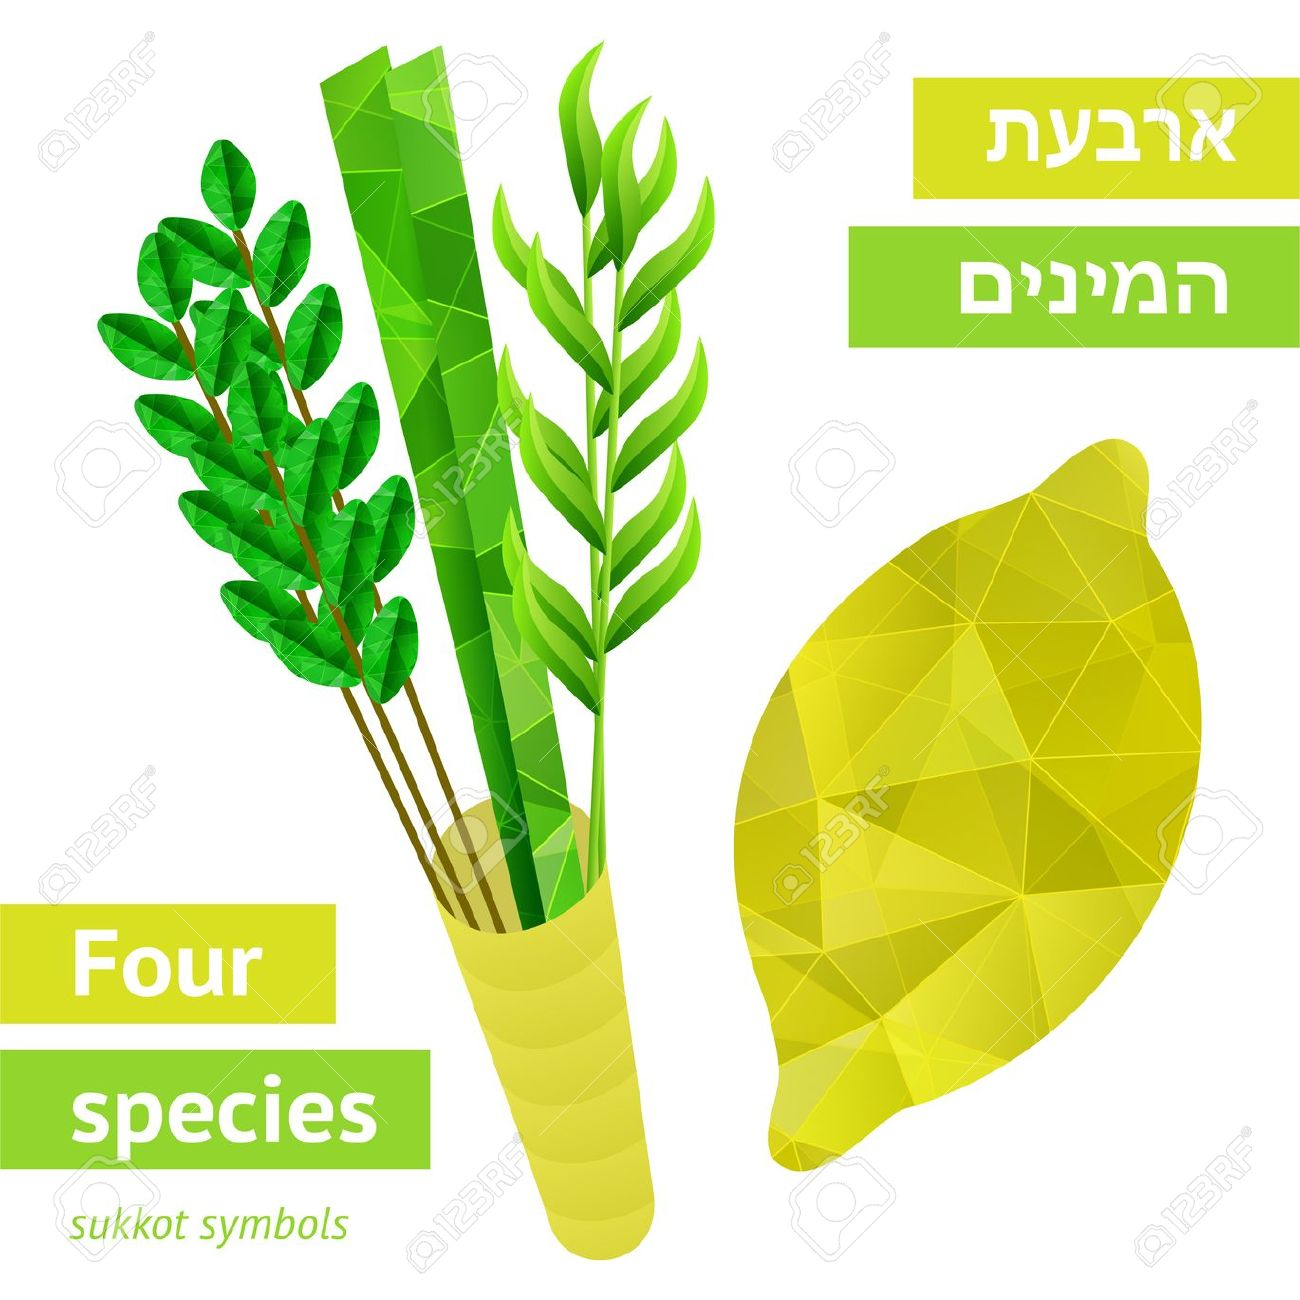 Four Species.